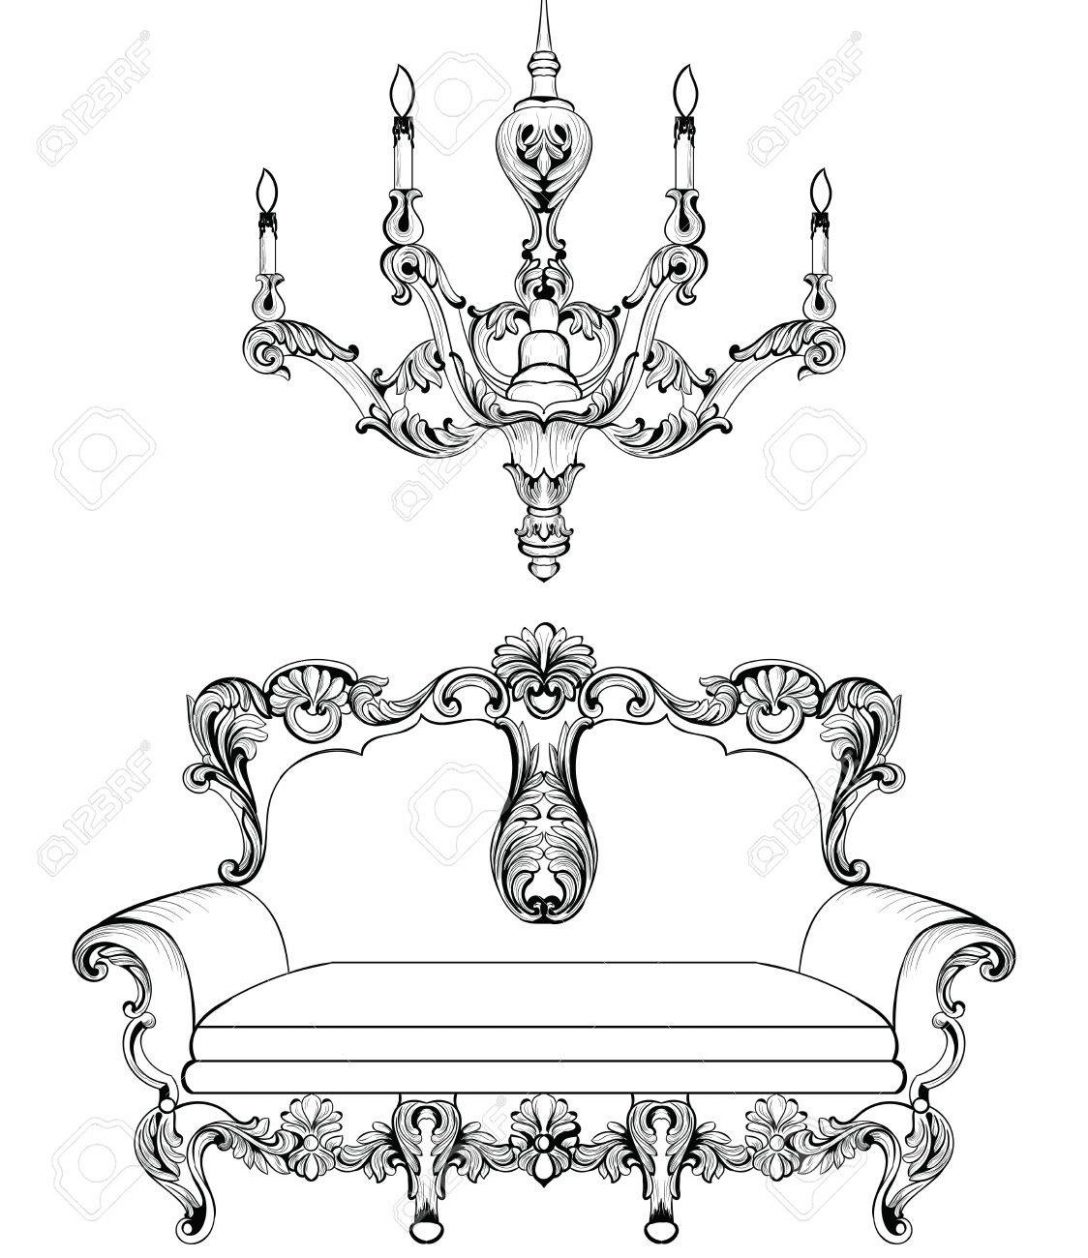 Large Size of Barock Sofa Exquisite Fabulous Imperial Und Kronleuchter Graviert Bullfrog Konfigurator Machalke Günstig Kaufen Xora Bunt 3er Grau Leinen Mit Abnehmbaren Sofa Barock Sofa